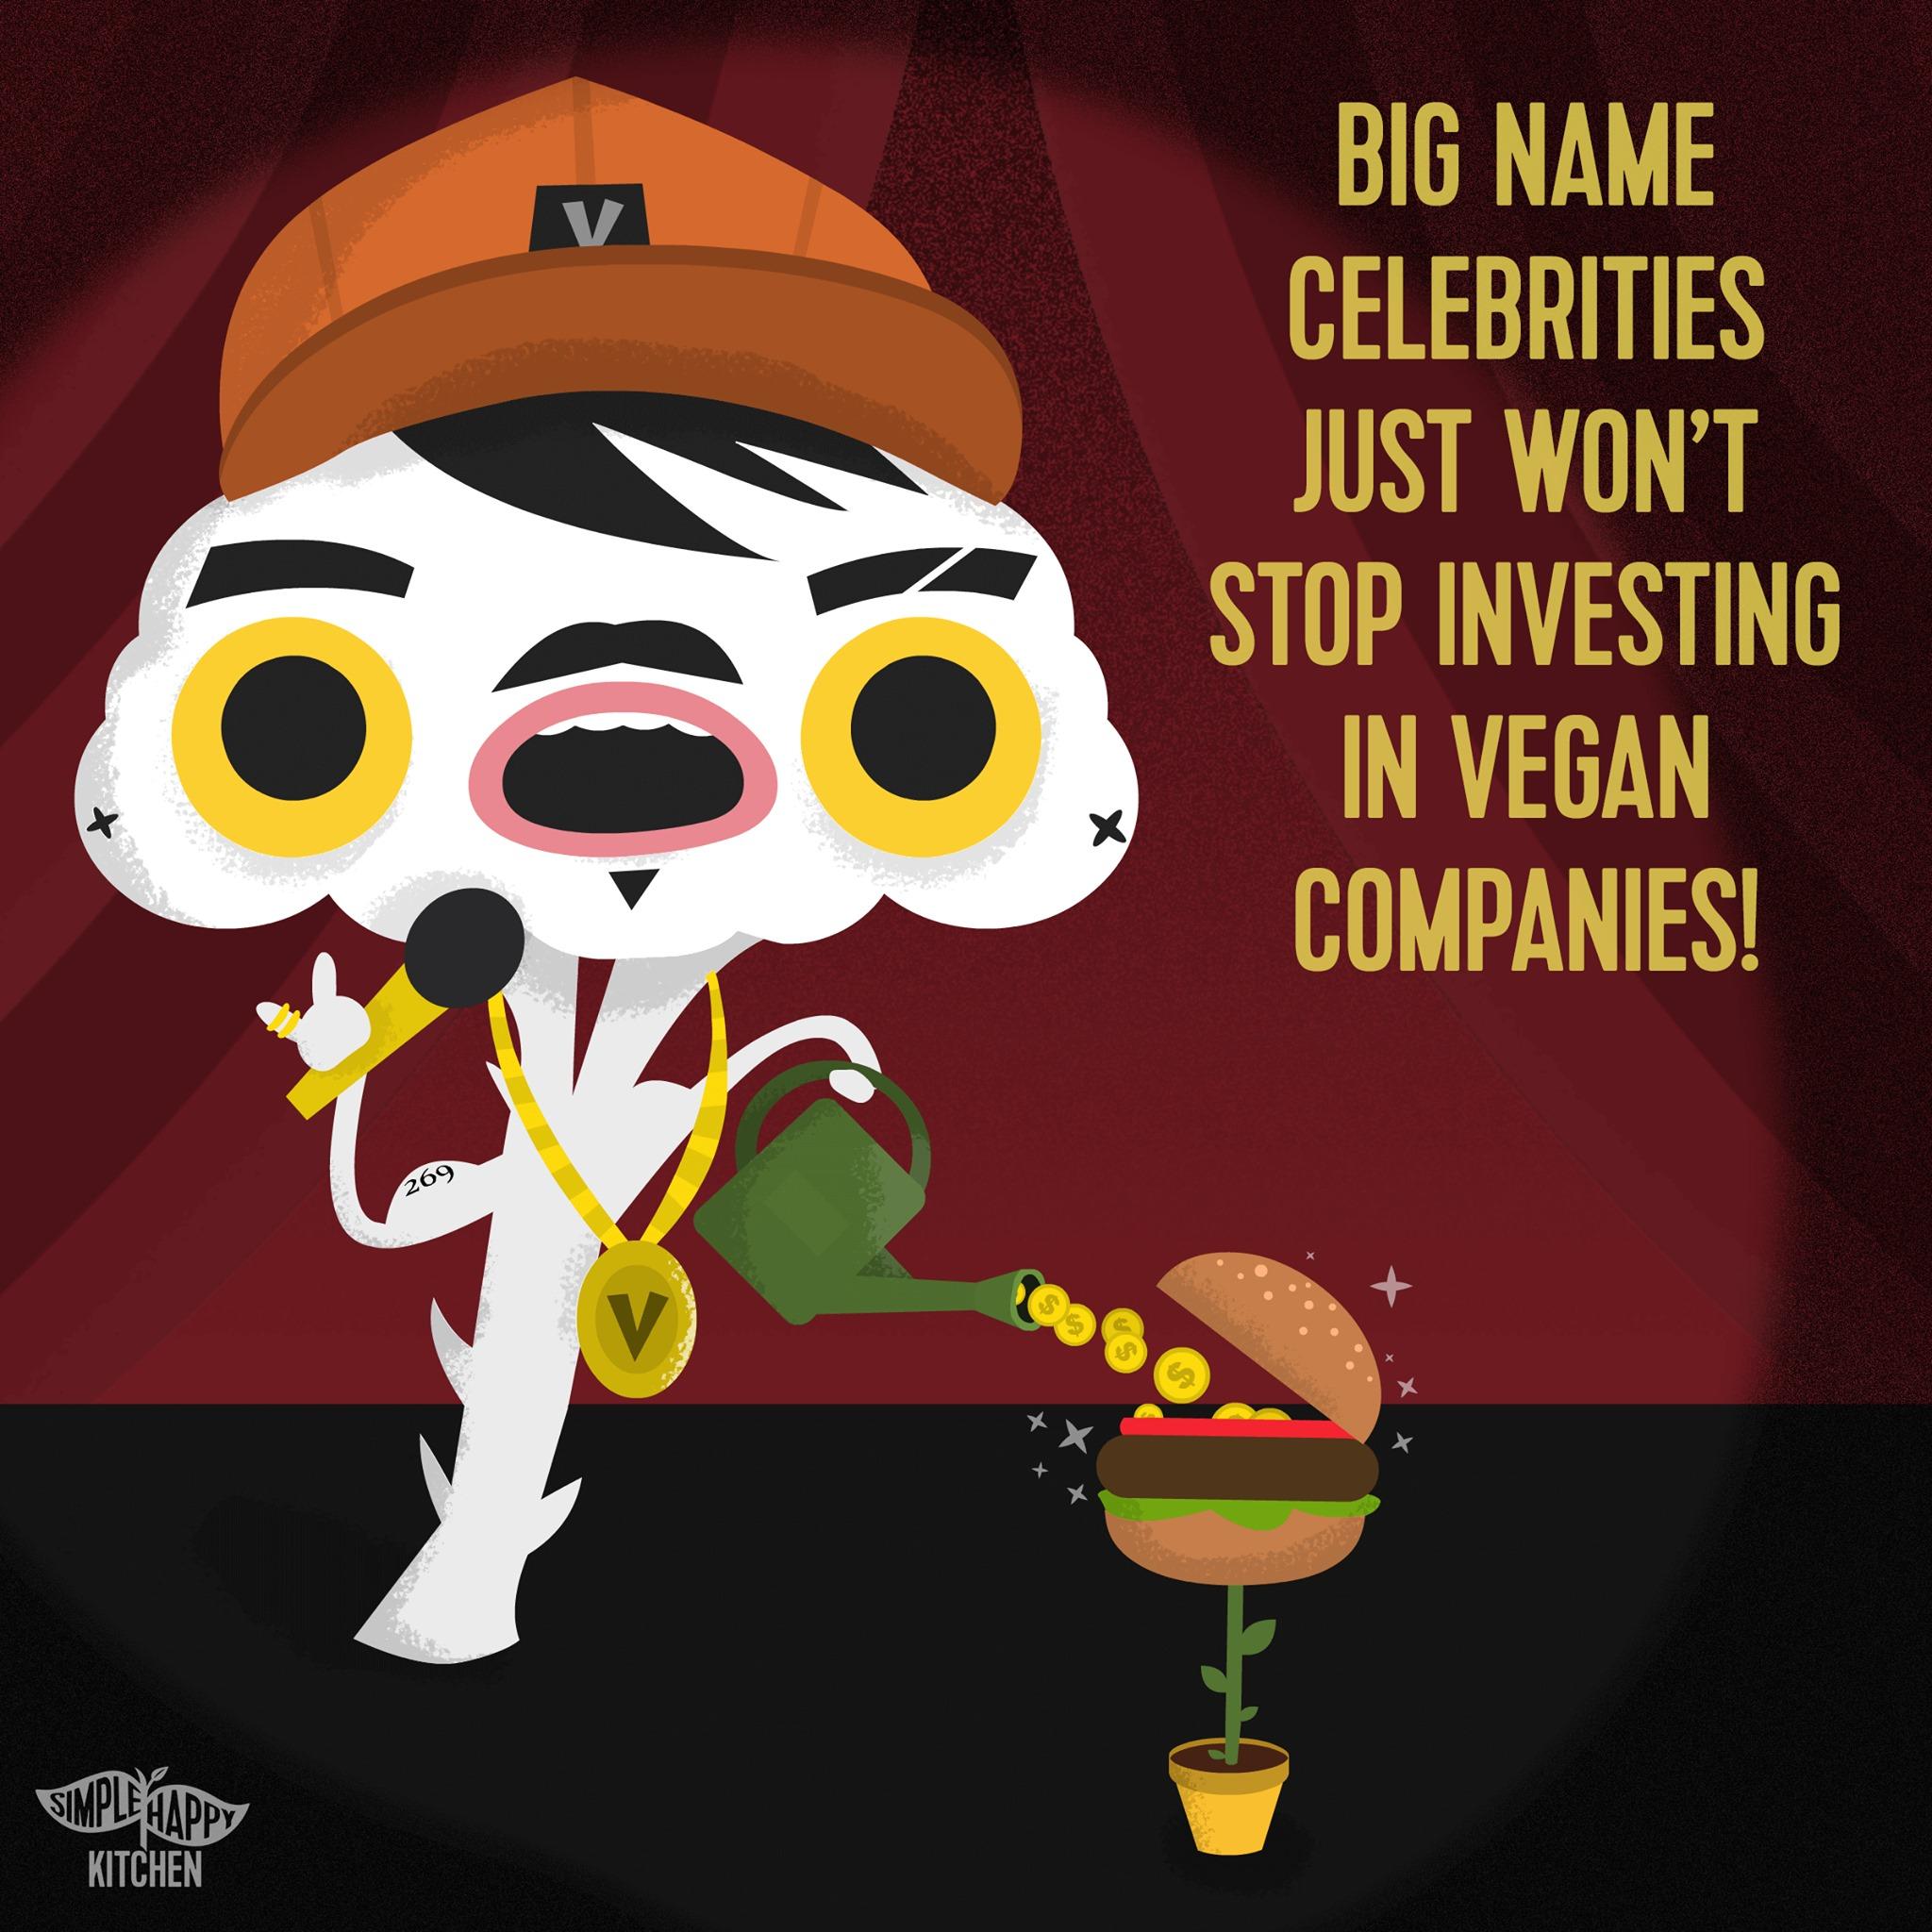 Big name celebrities just won't stop investing in vegan companies!